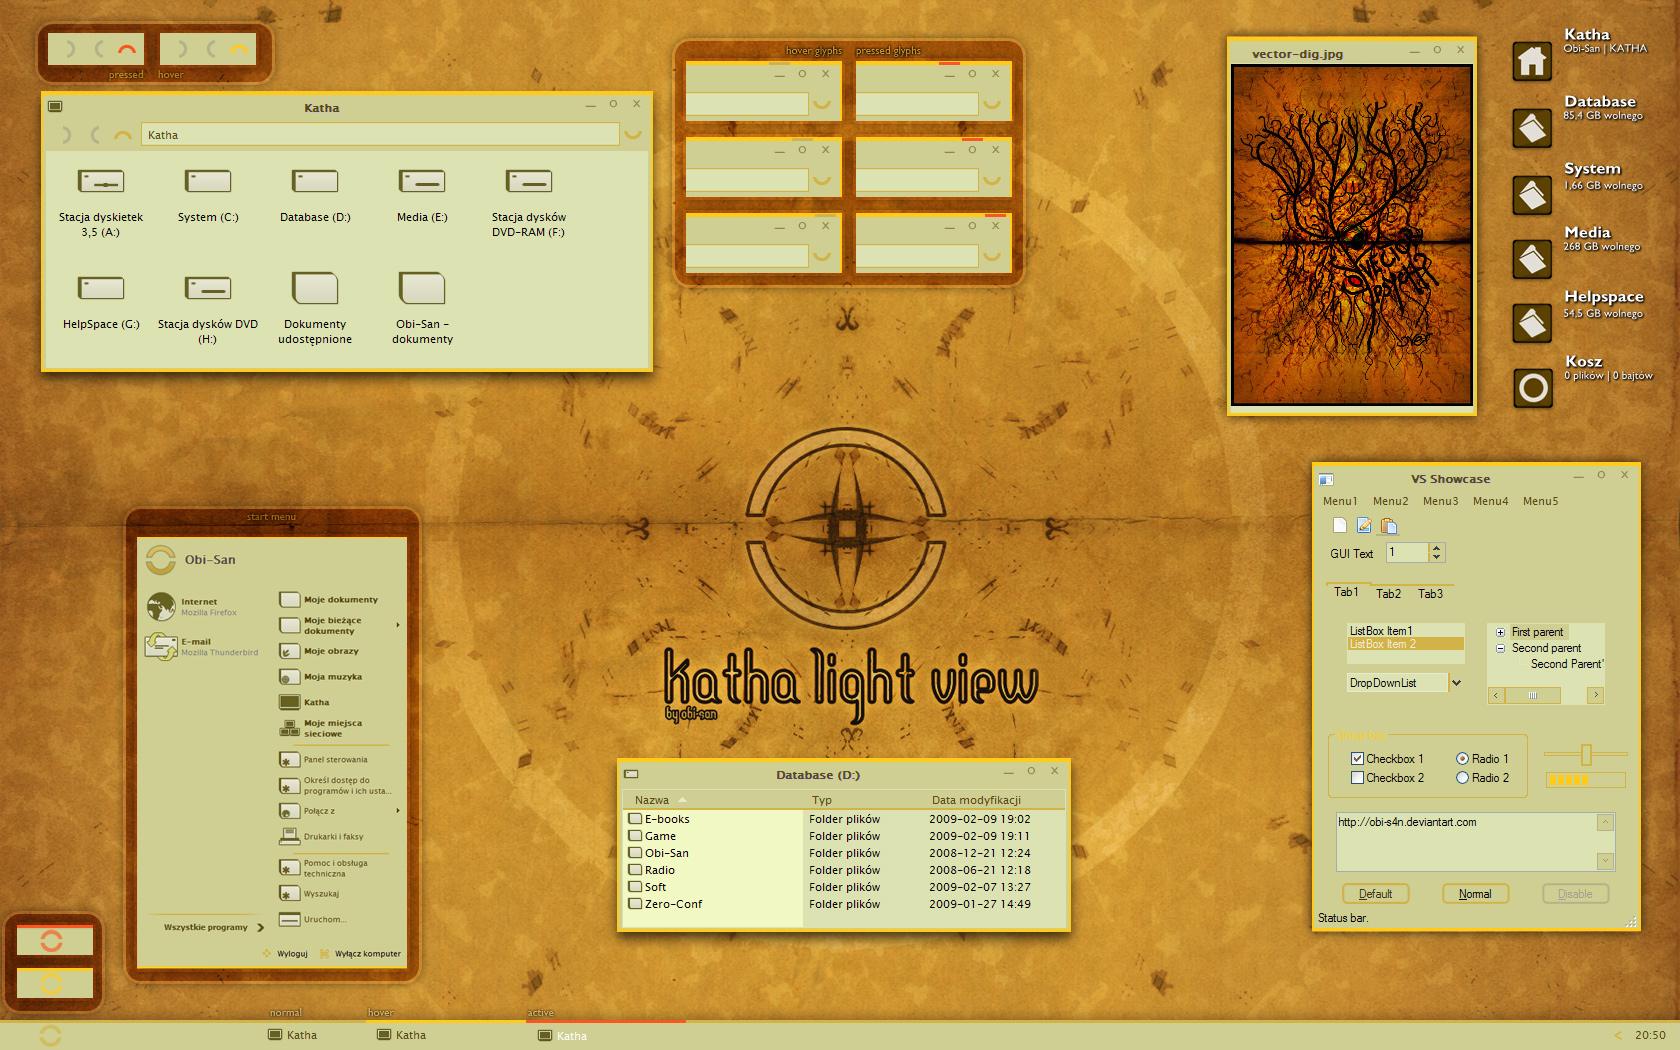 Katha Light View 2009 by Obi-S4n